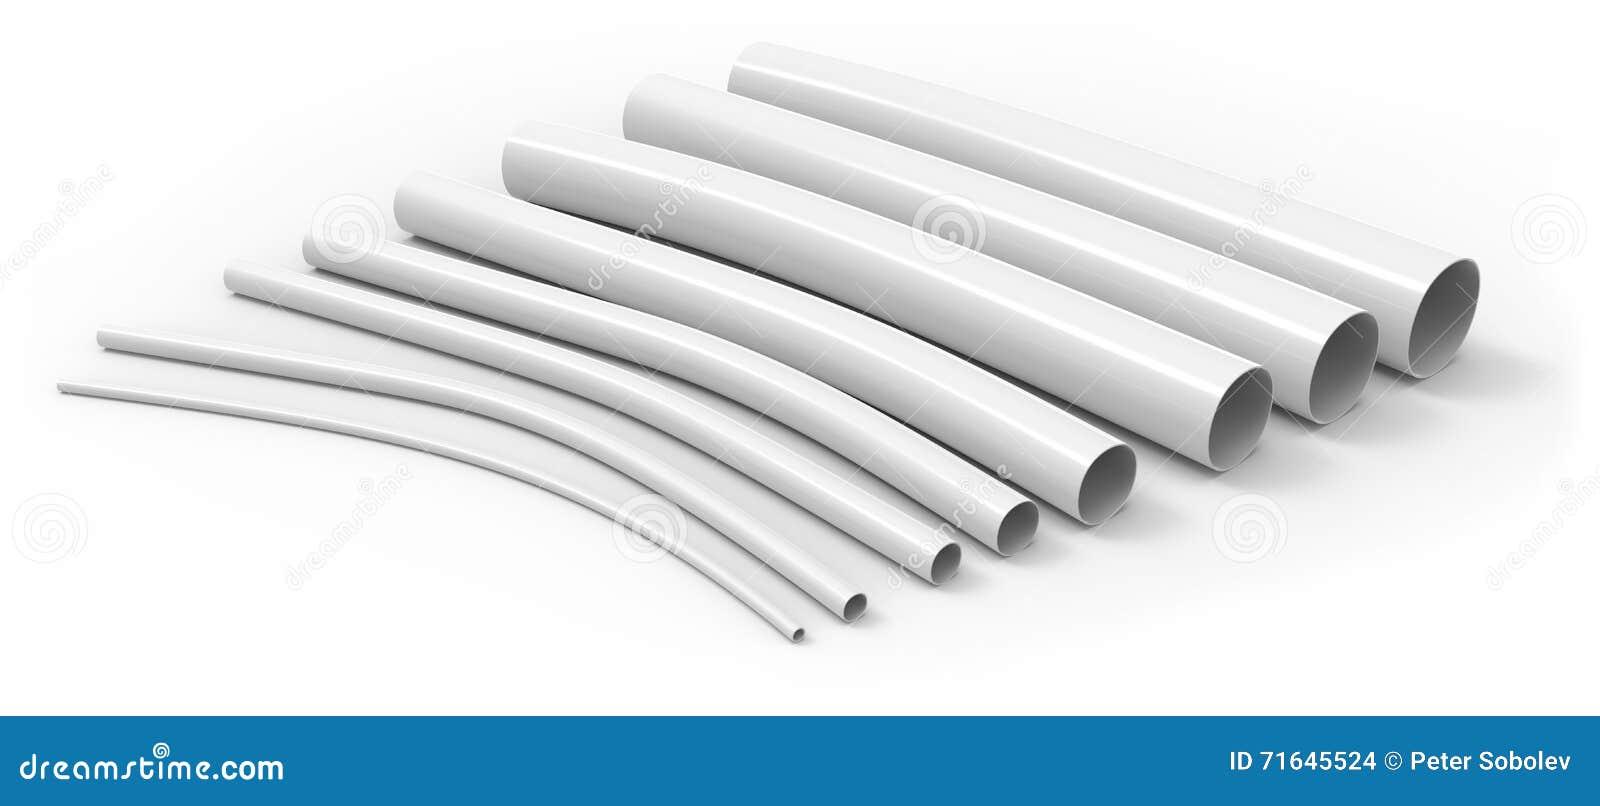 Flexible Plastic Tubing : Flexible plastic tubing stock illustration image